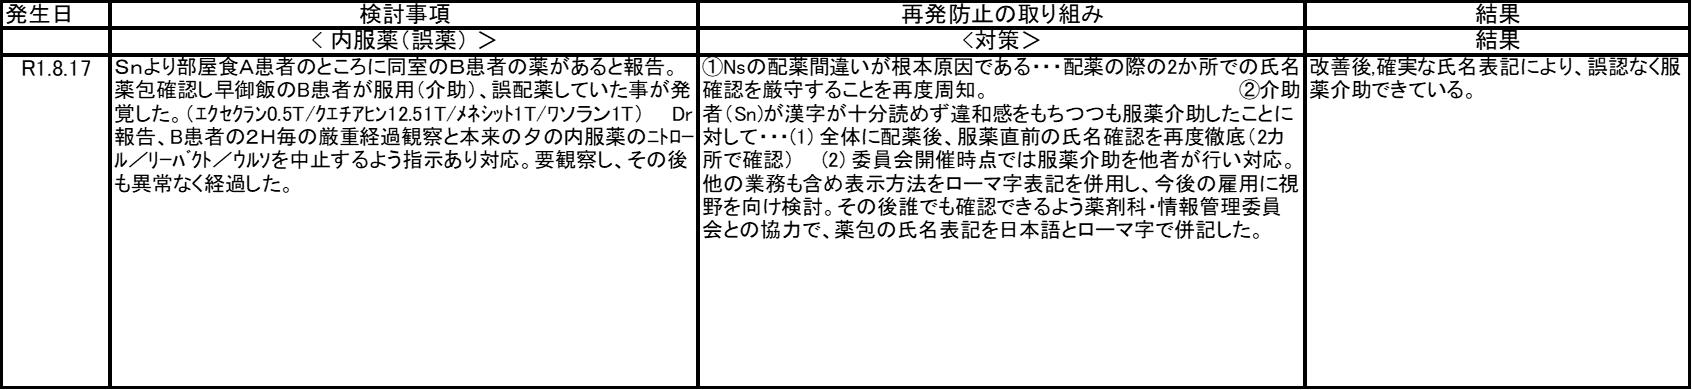 safety_H31_05